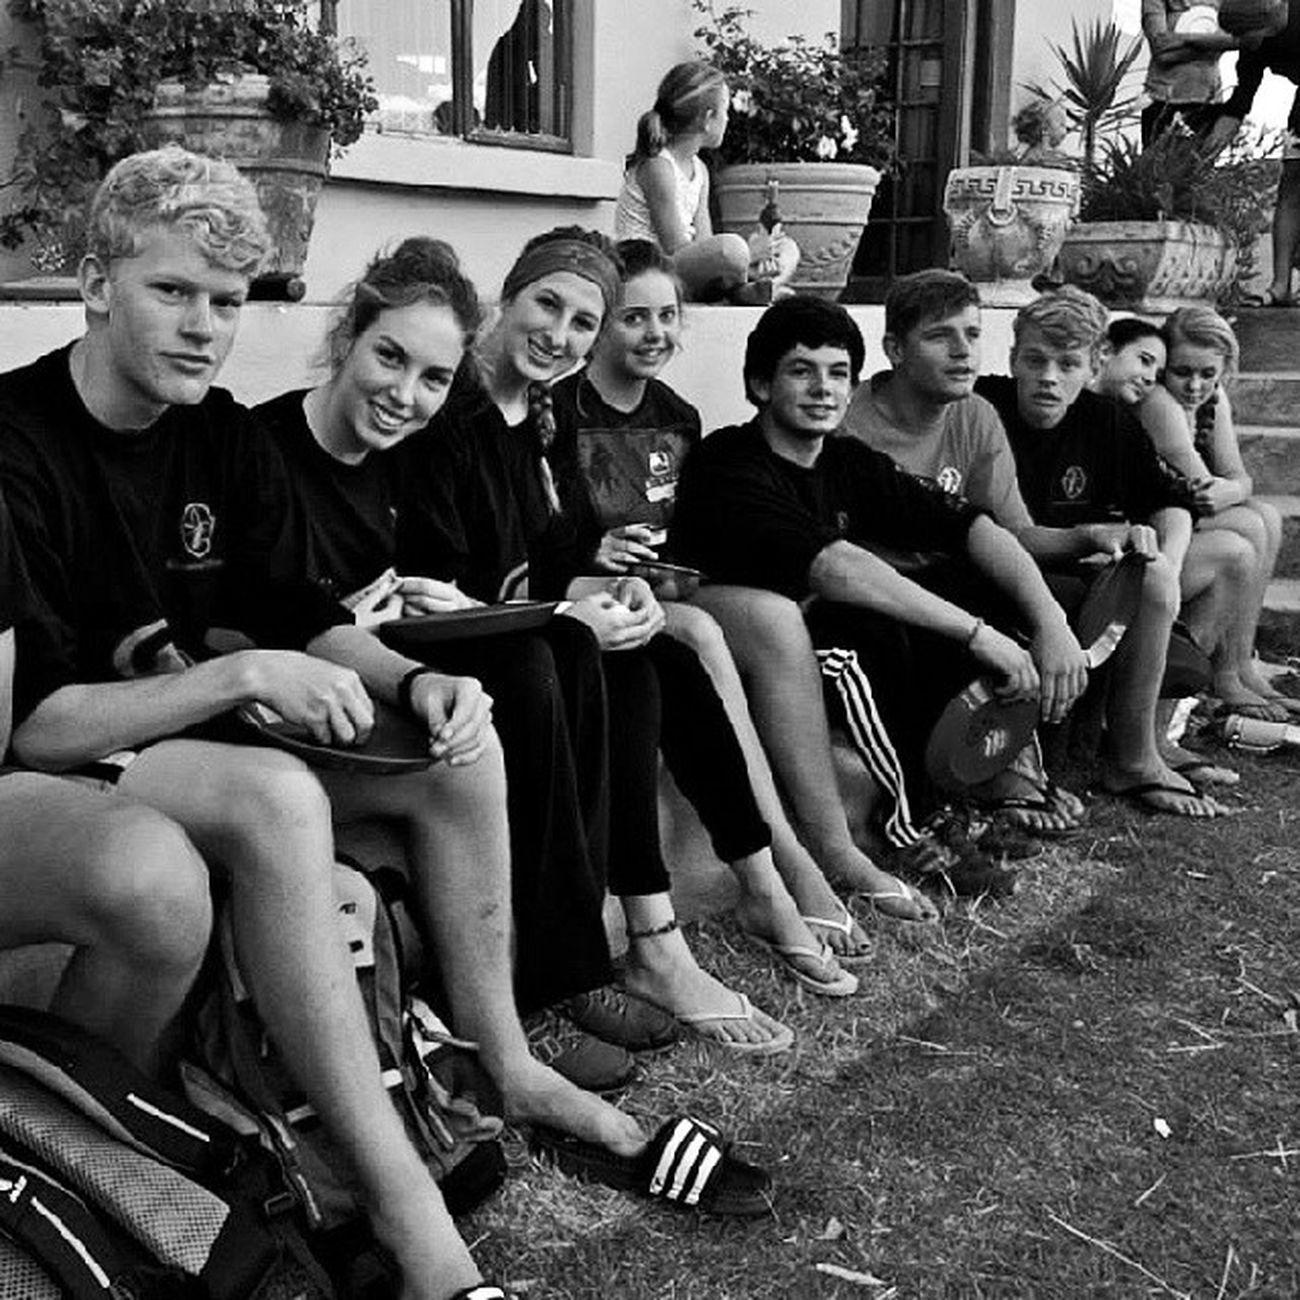 Gkc Summer Southafrica Indiekids lazynights goodvibes gypsie boho happiness garden